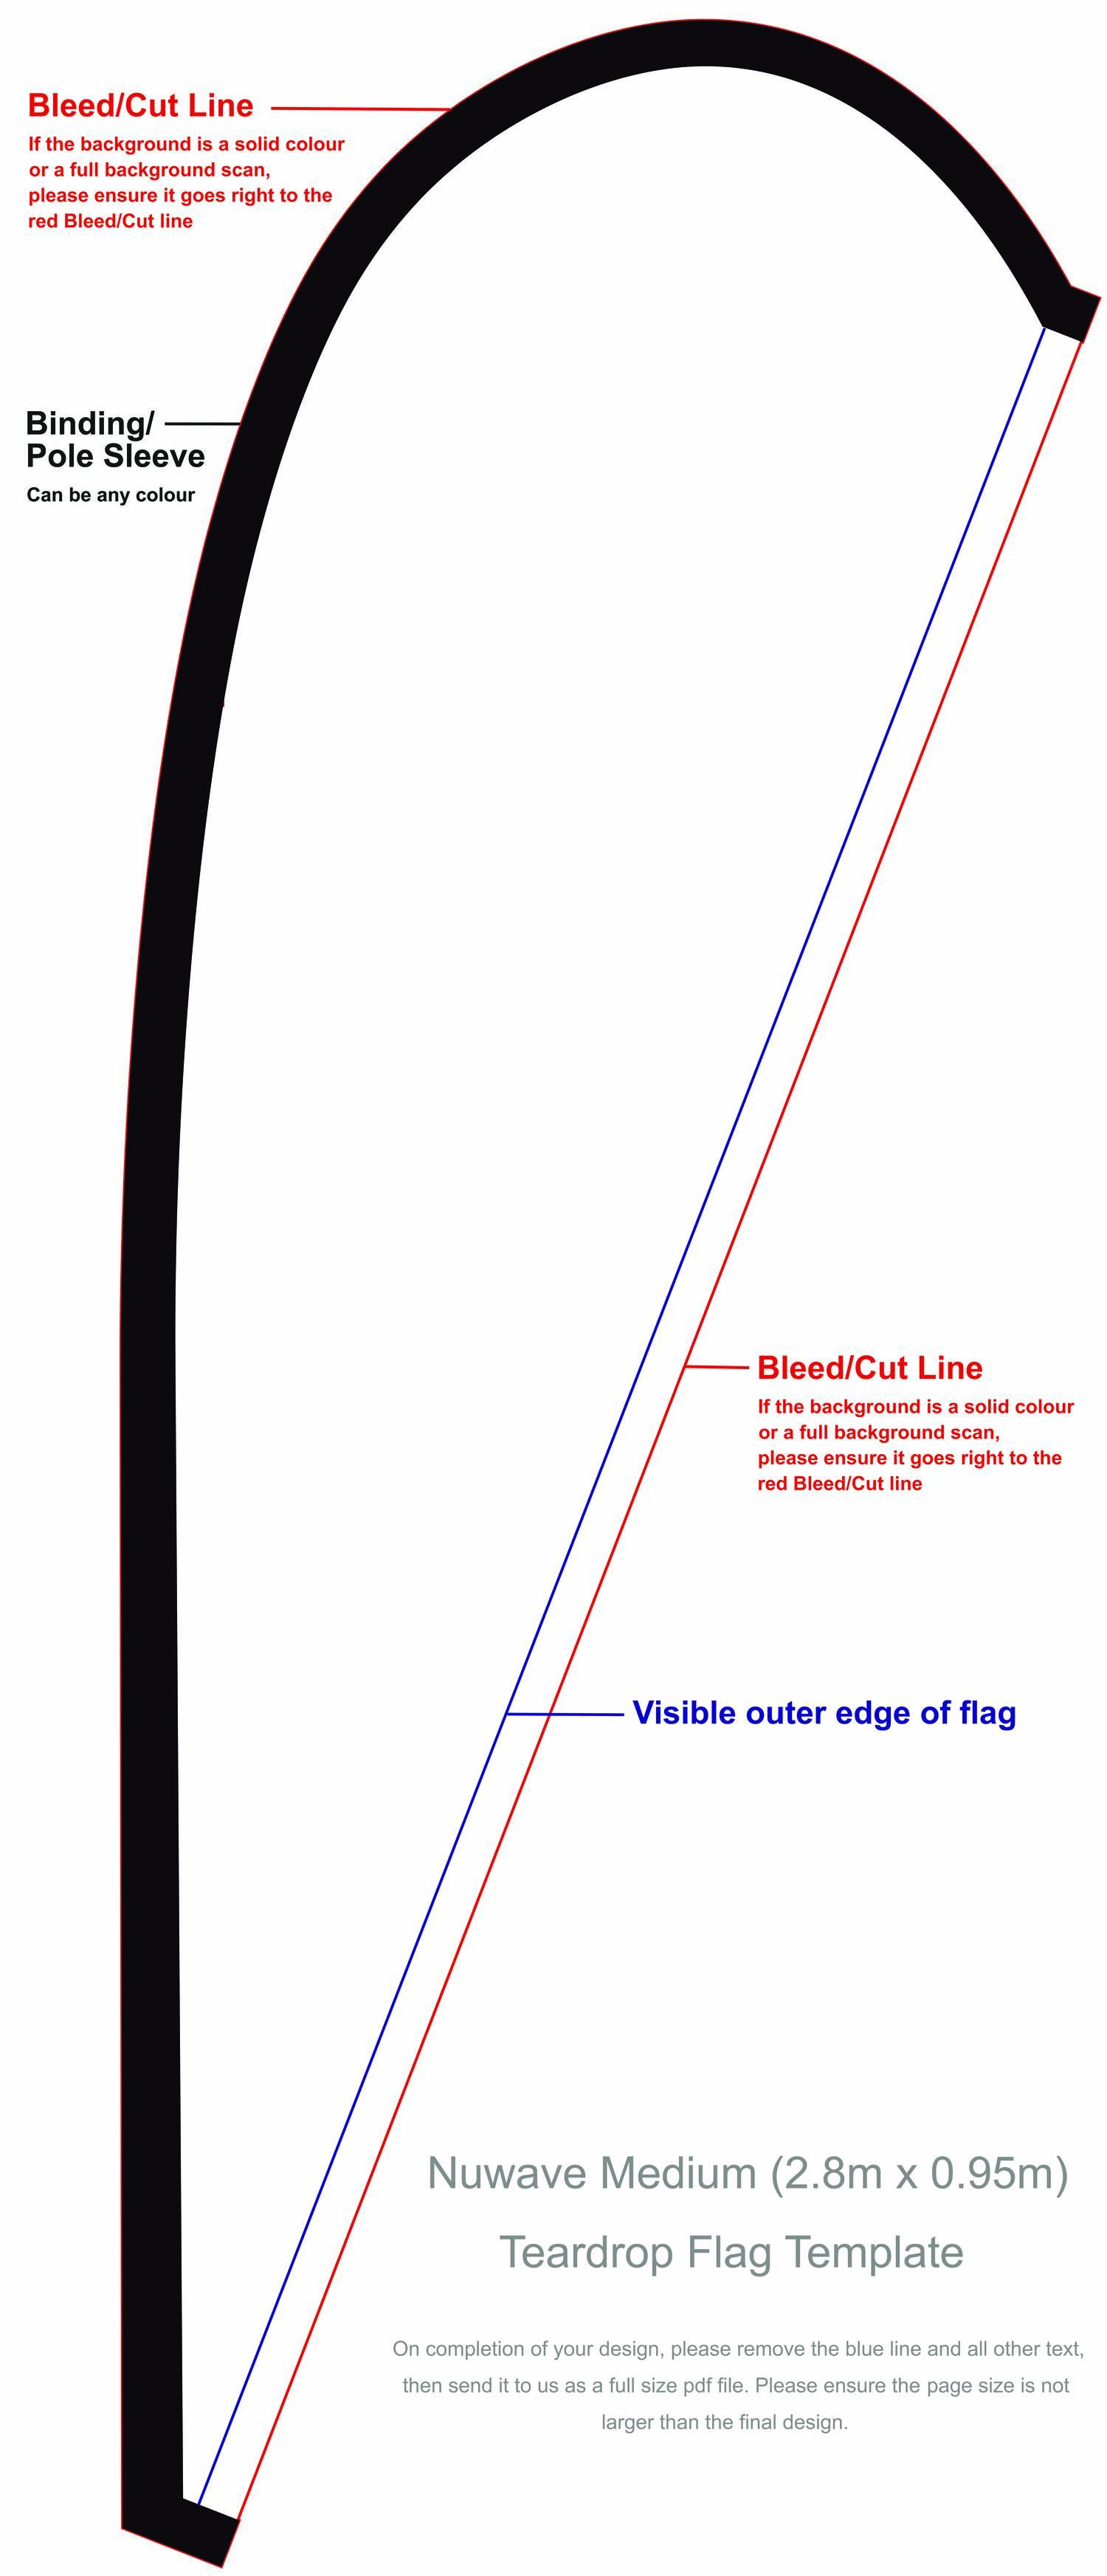 Teardrop Flag Template